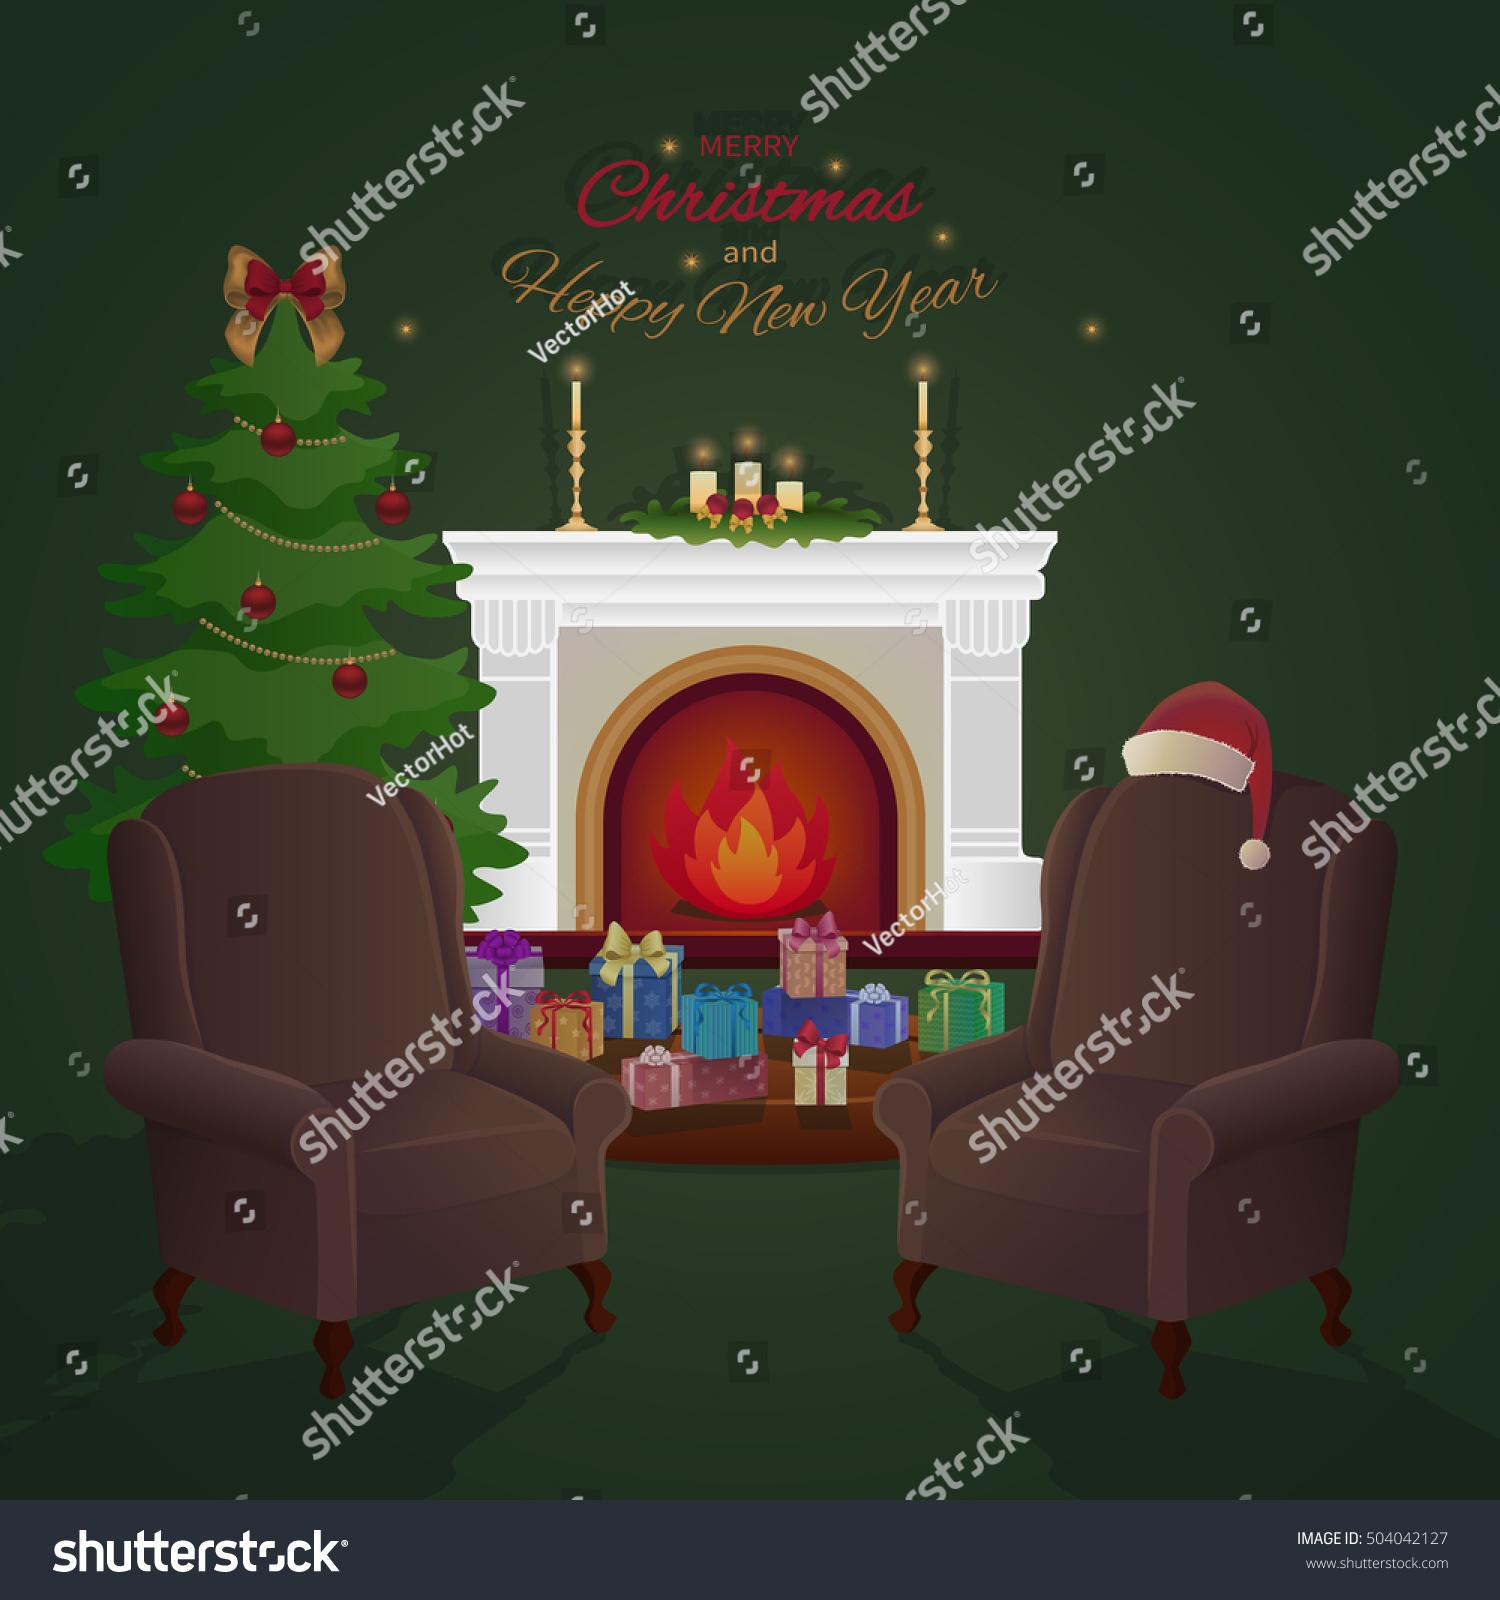 Merry Christmas Home Interior Fireplace Christmas Stock Vector